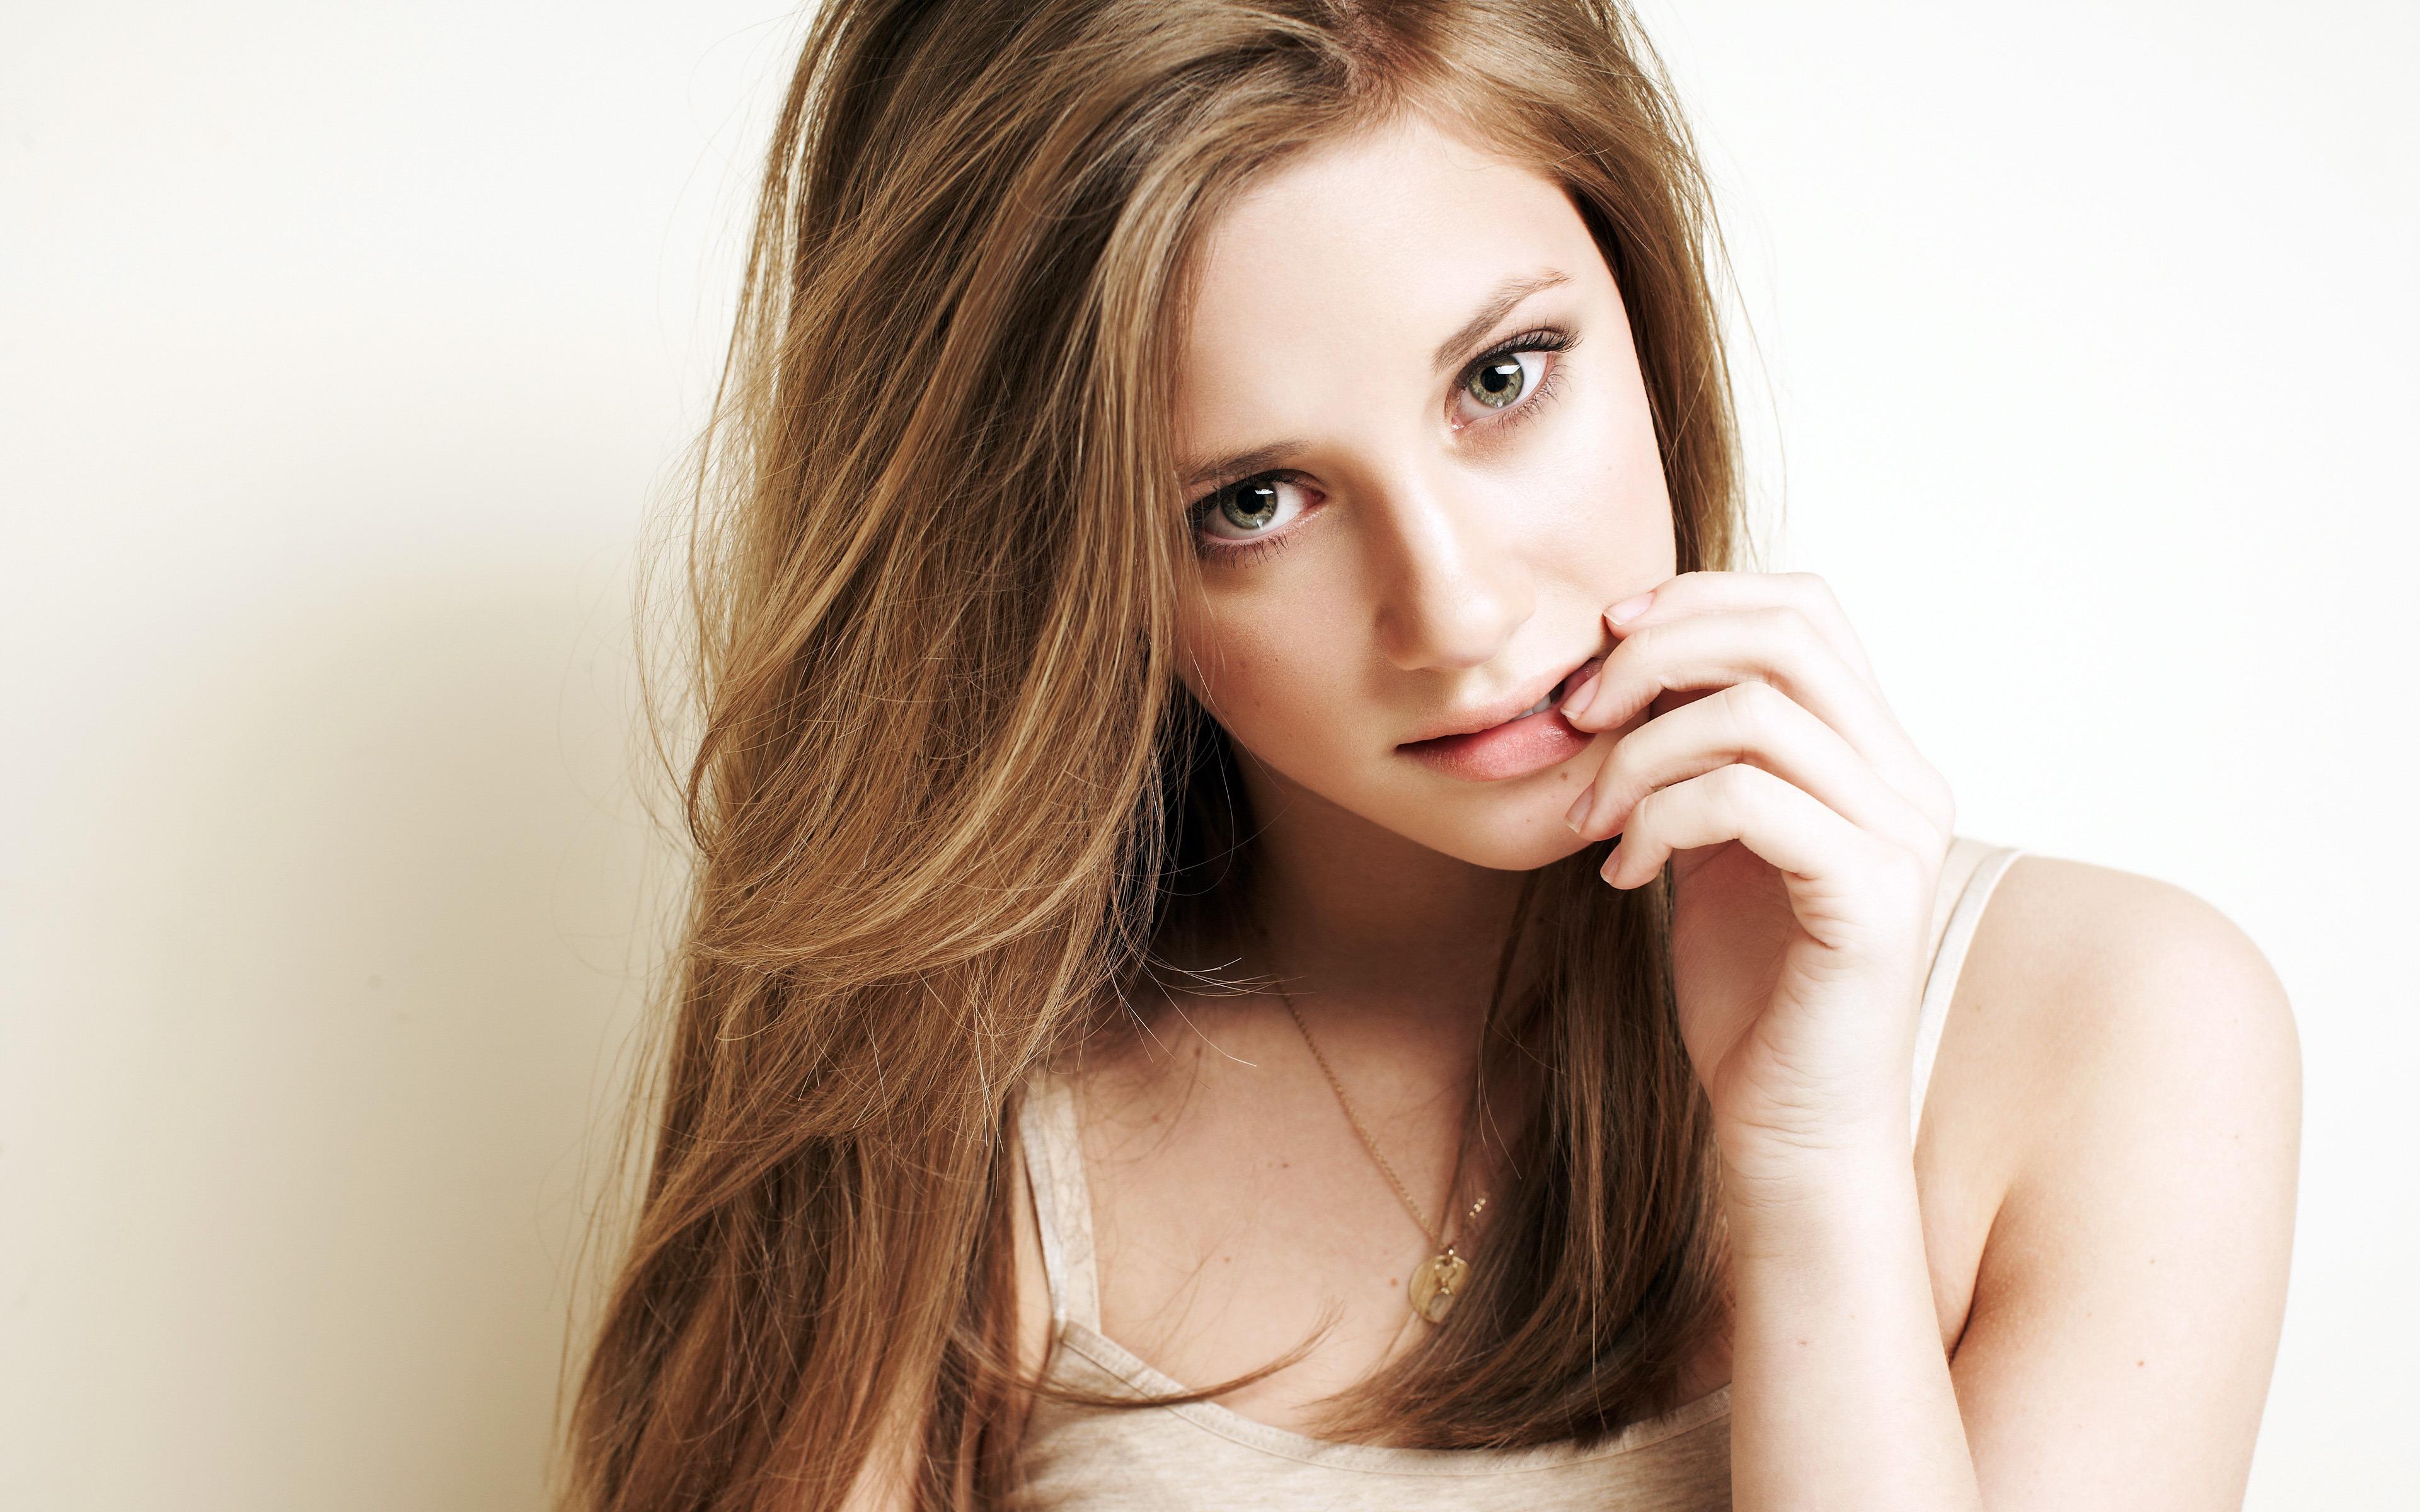 Download wallpapers Lili Reinhart 4k beauty american actress 3840x2400